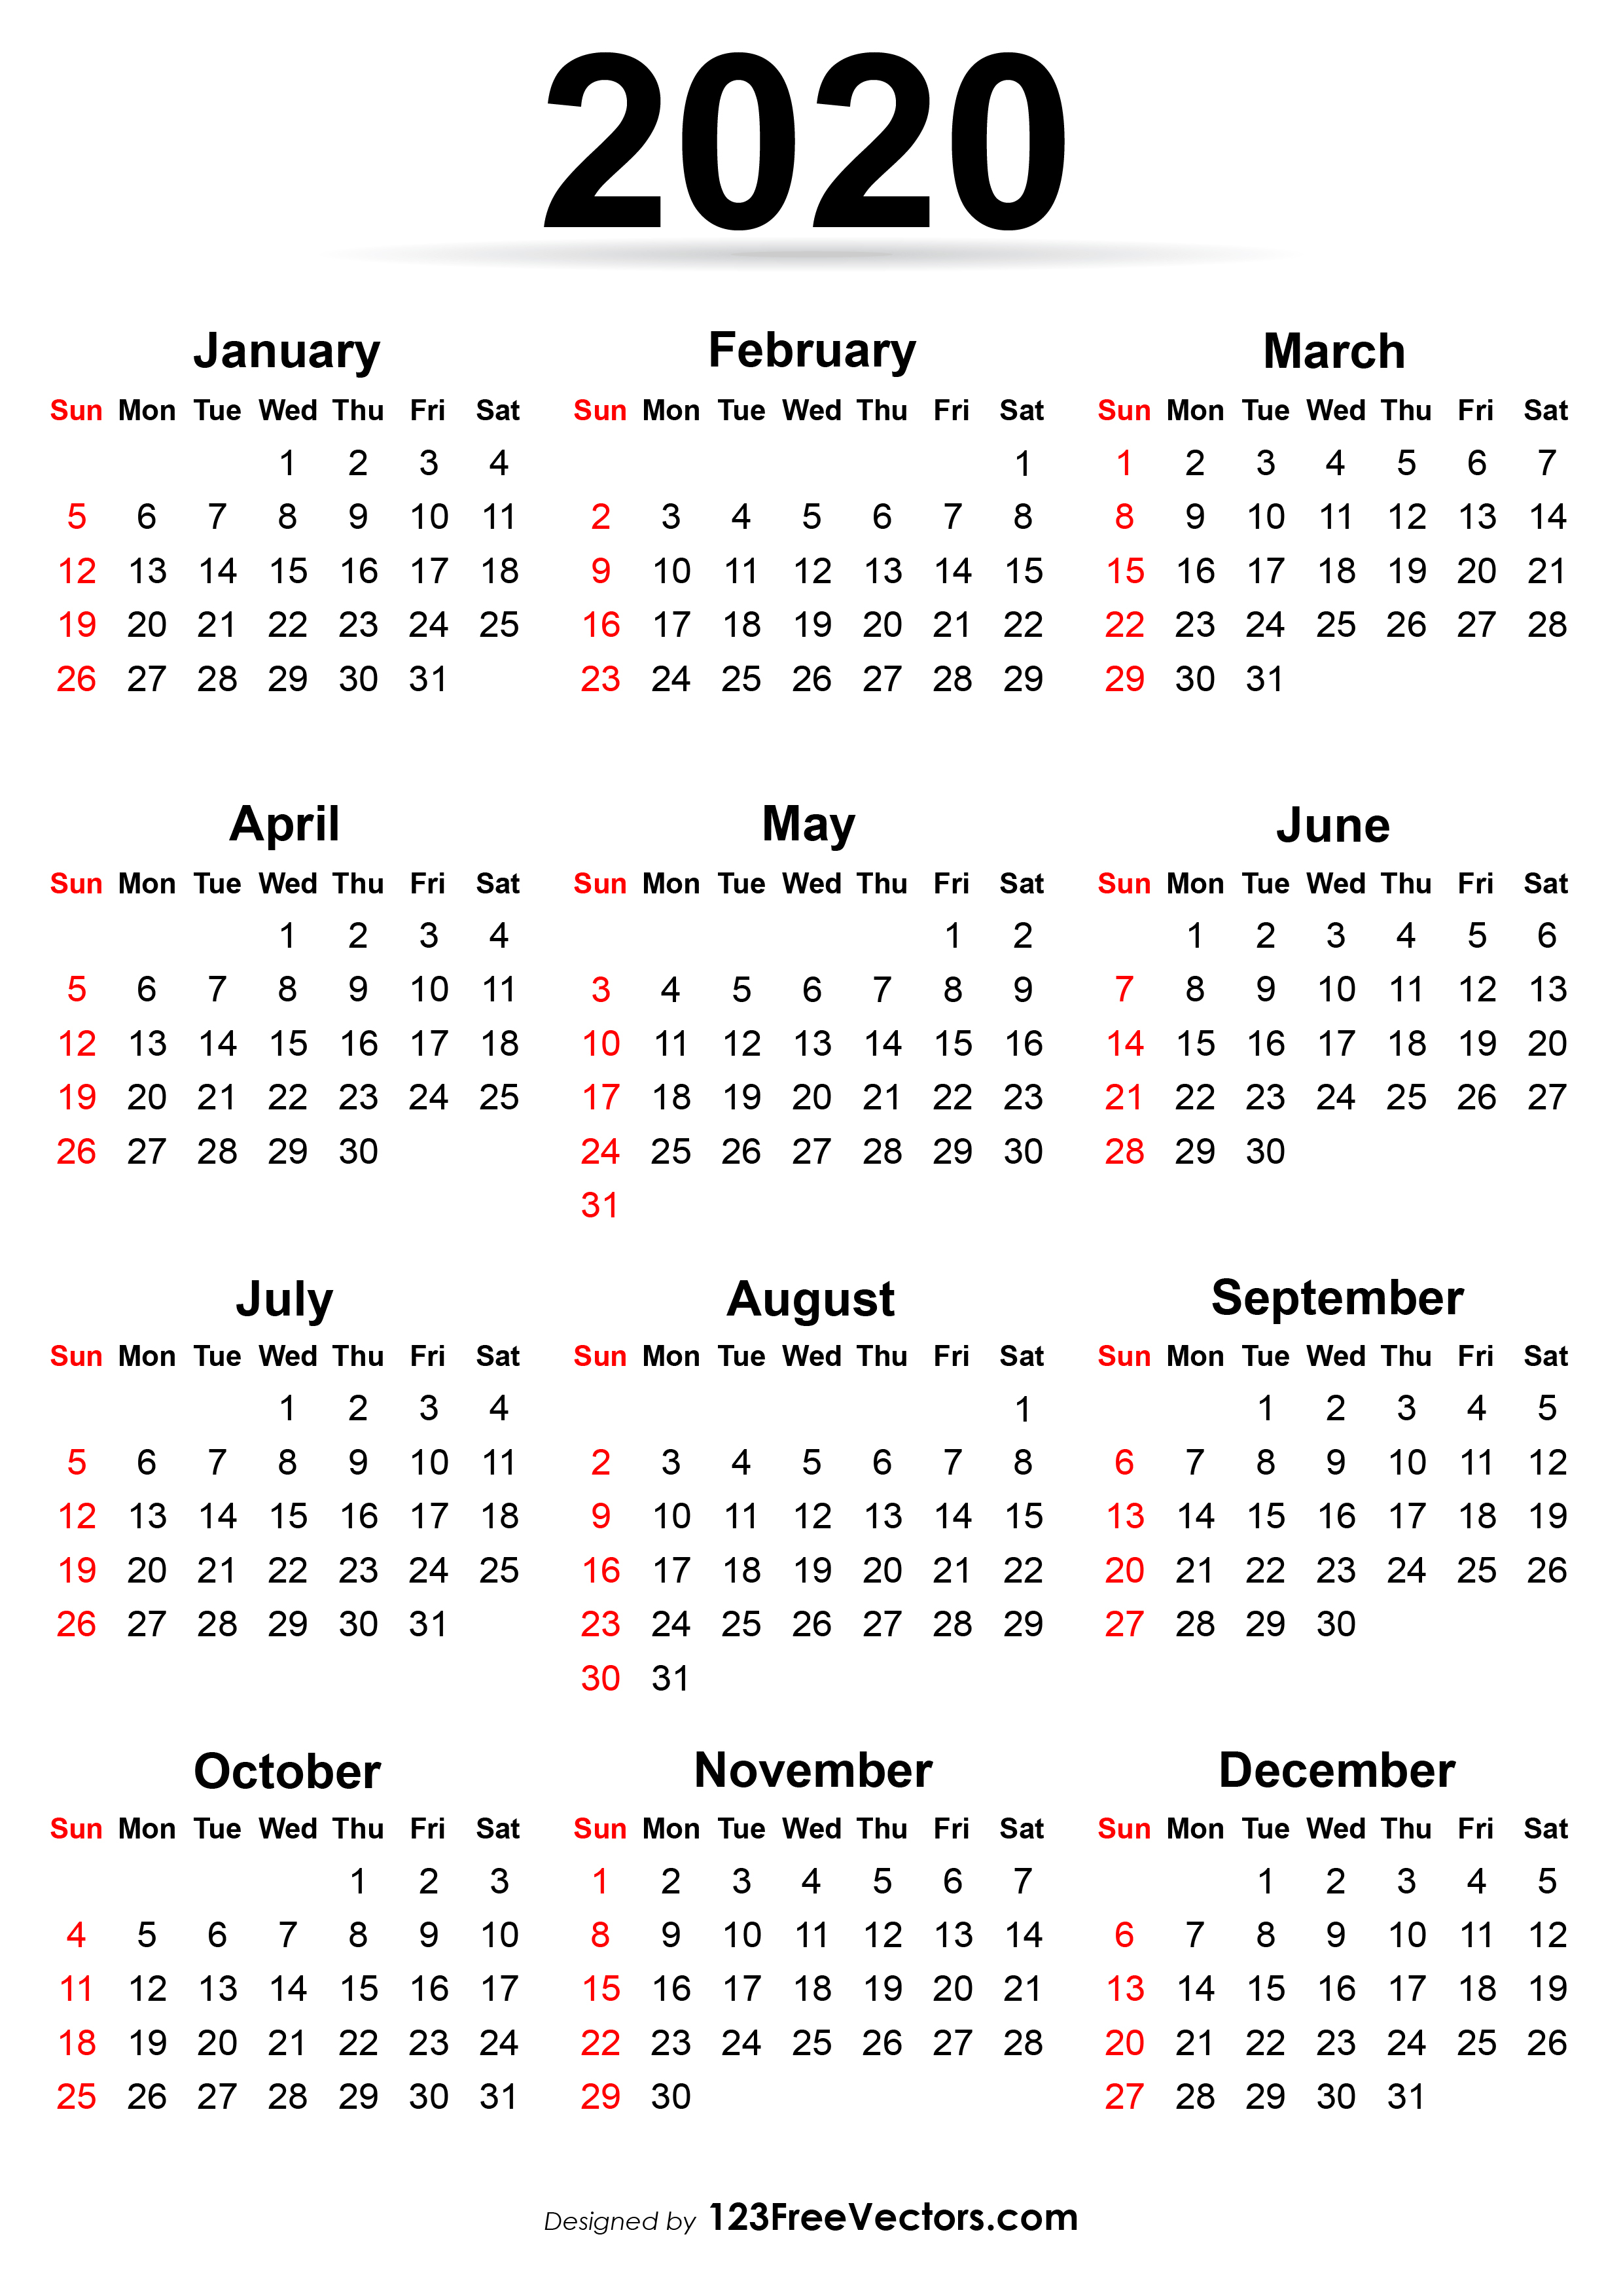 Printable Calendar 2020 within Printable 2020 Calander